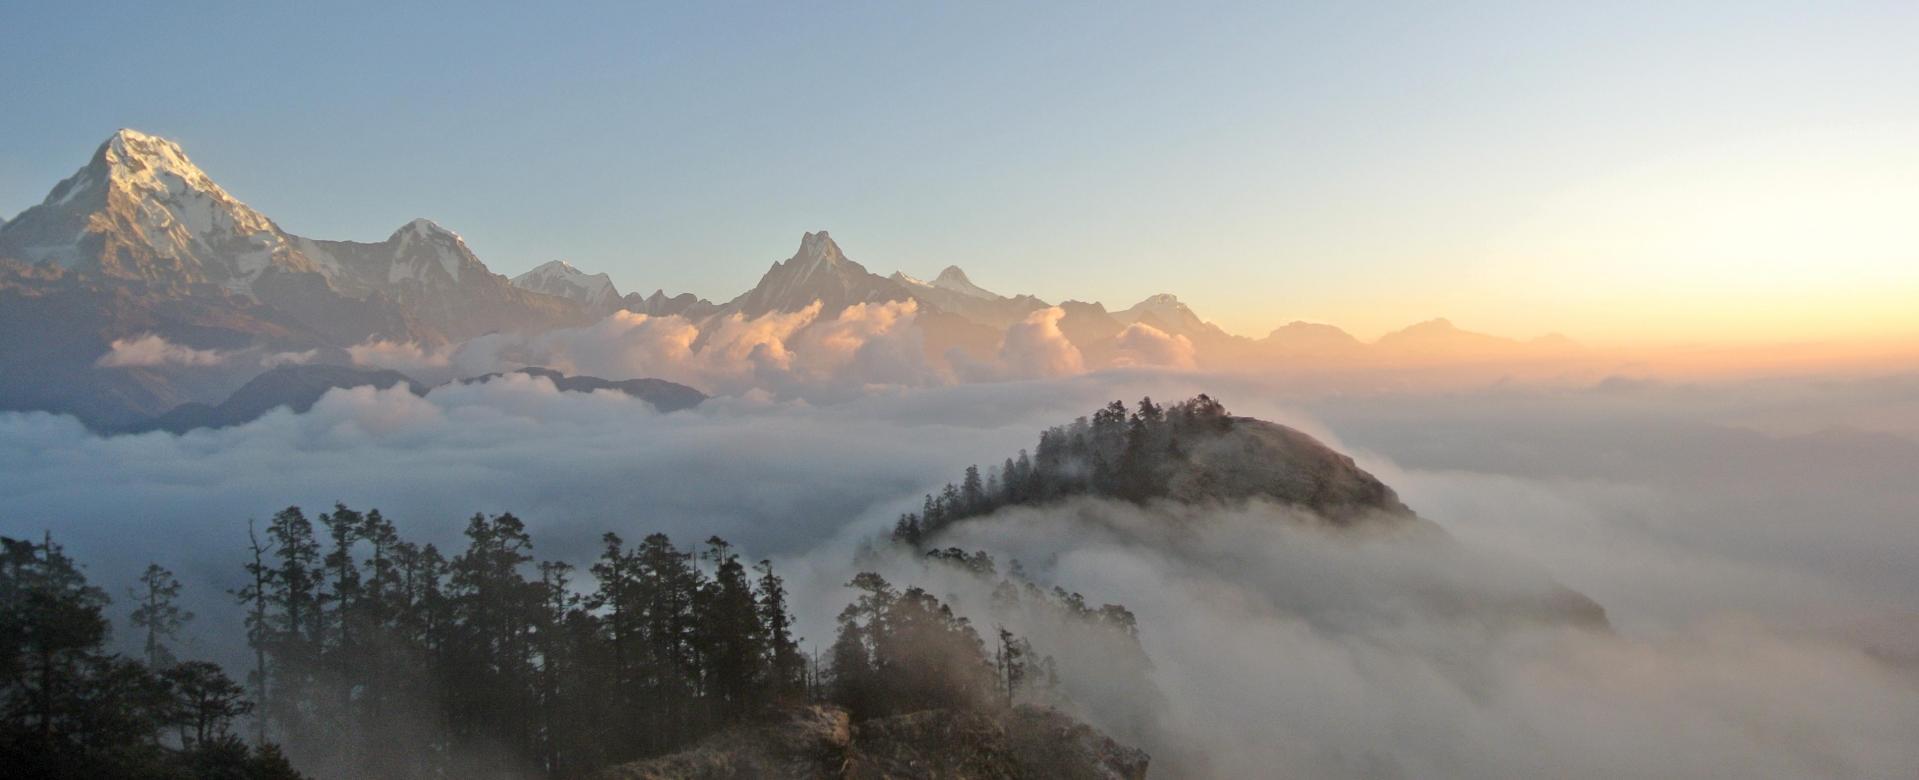 Voyage à pied : Kopra ridge : balcon des annapurnas et dhaulagiris